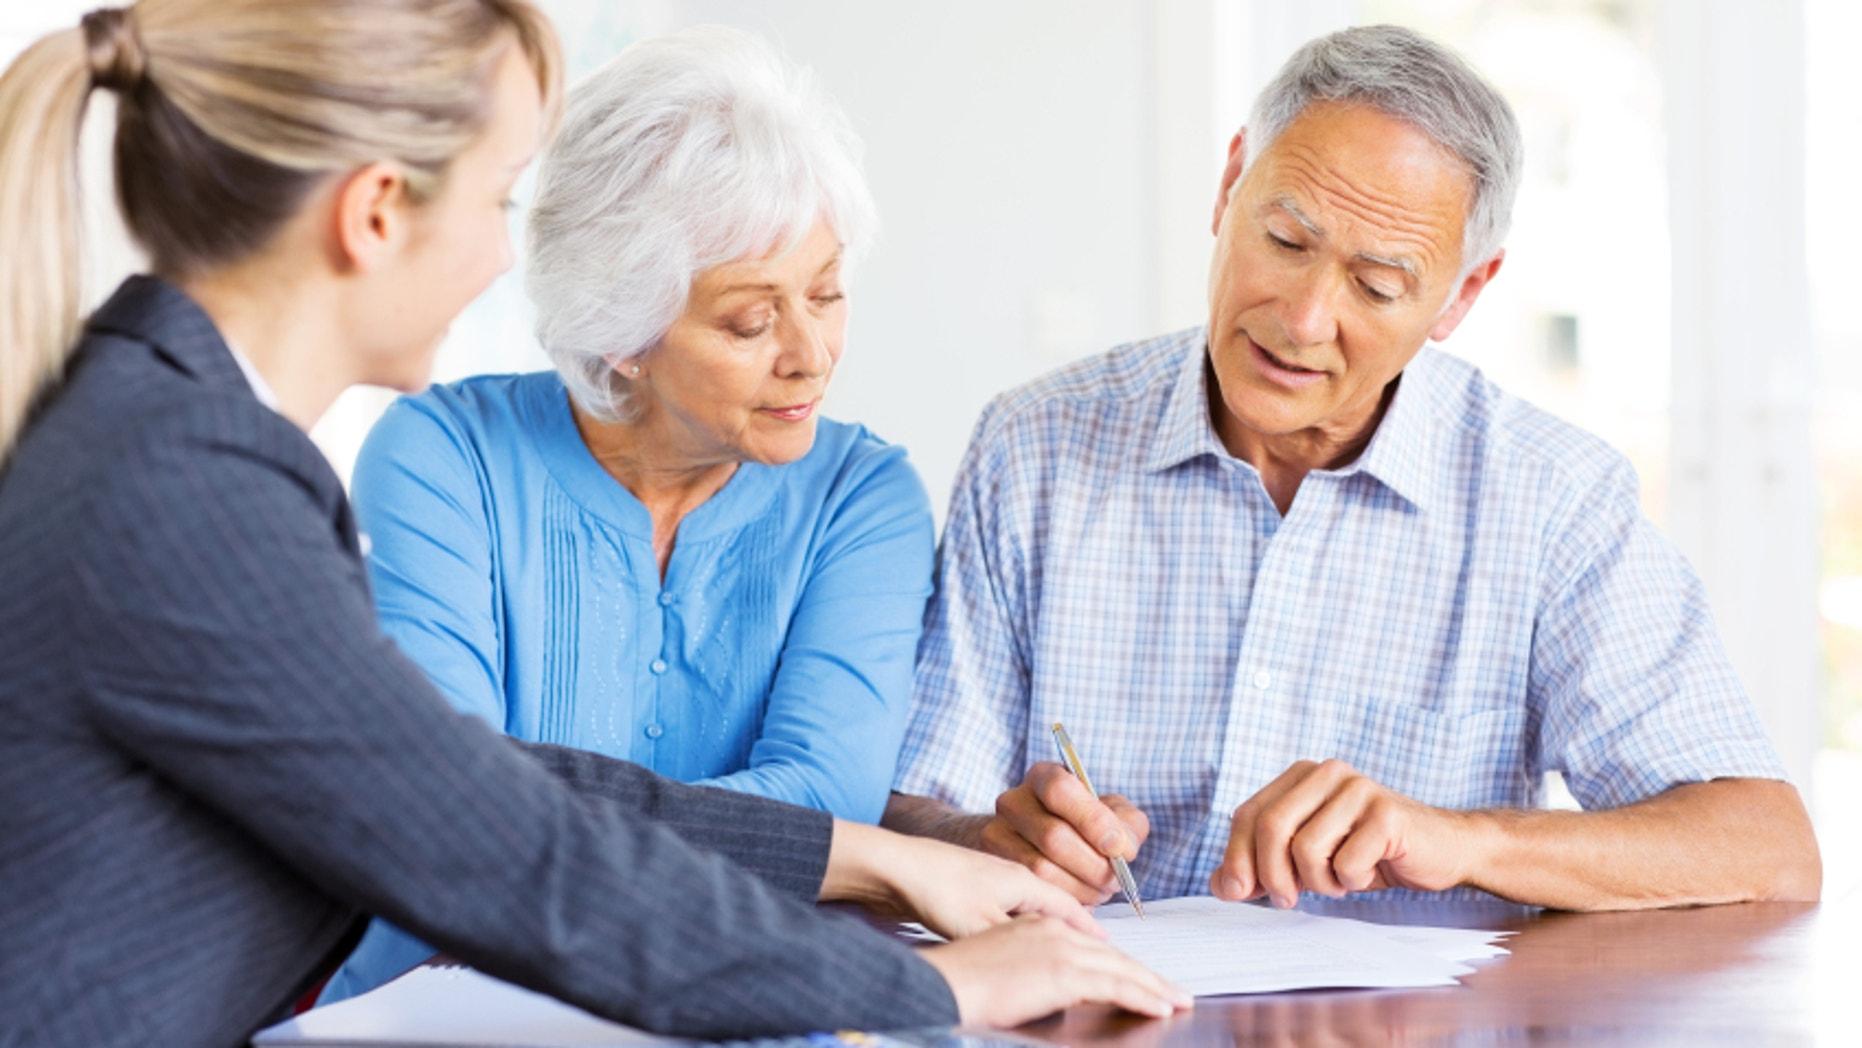 Financial advisor explaining investment plans to senior couple at home. Horizontal shot.